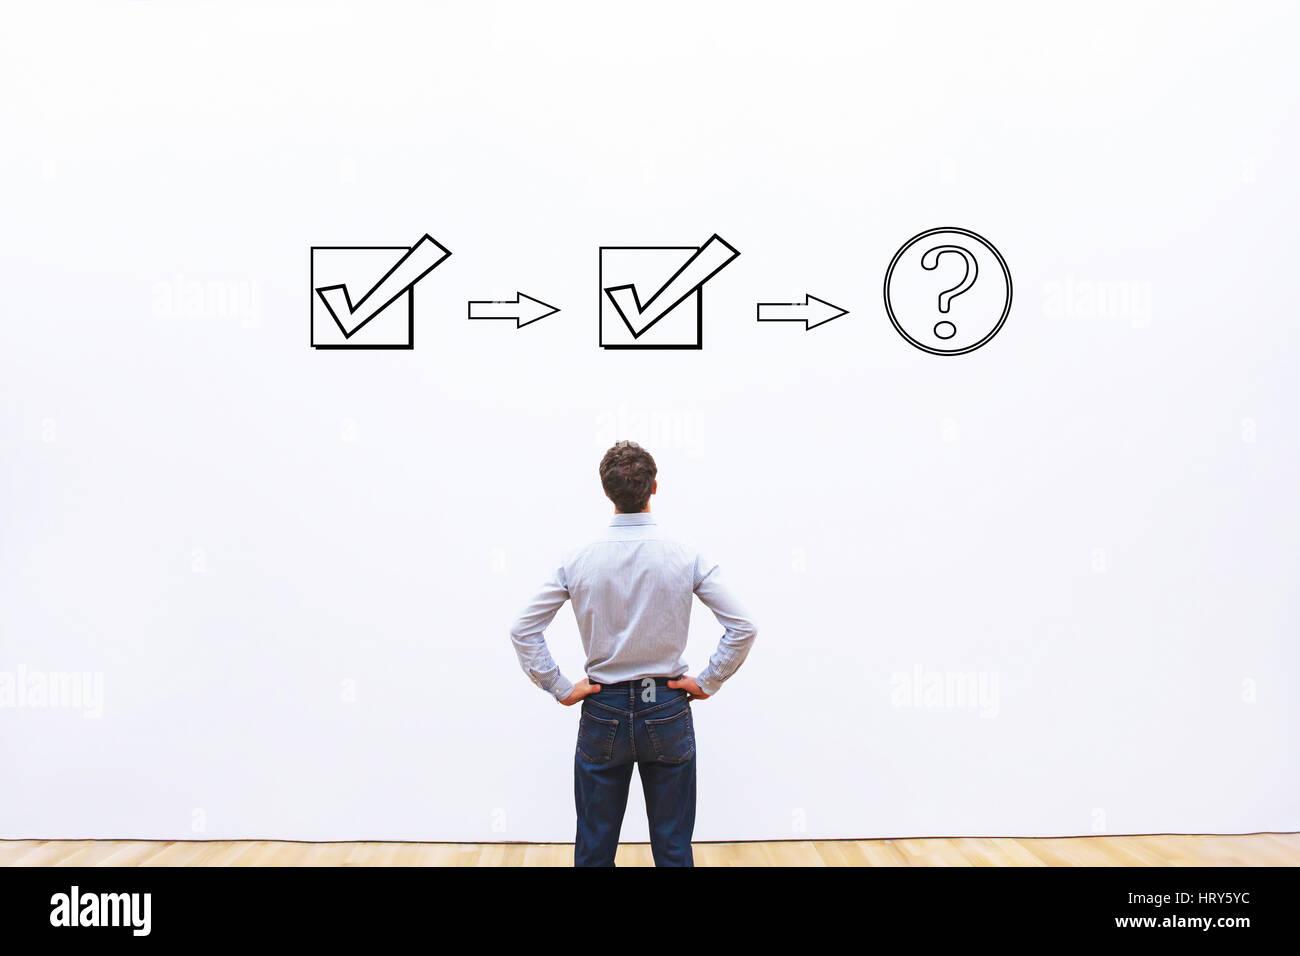 business process workflow concept, question about next step, flowchart - Stock Image